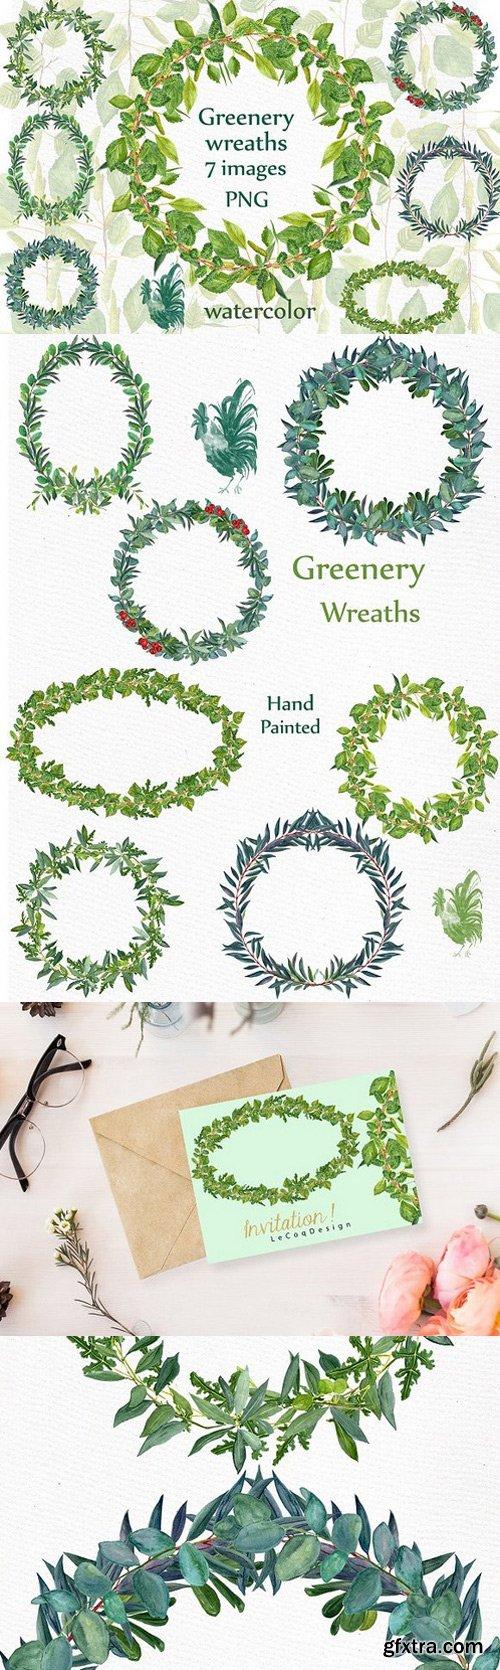 Watercolor Fern Wreaths clipart